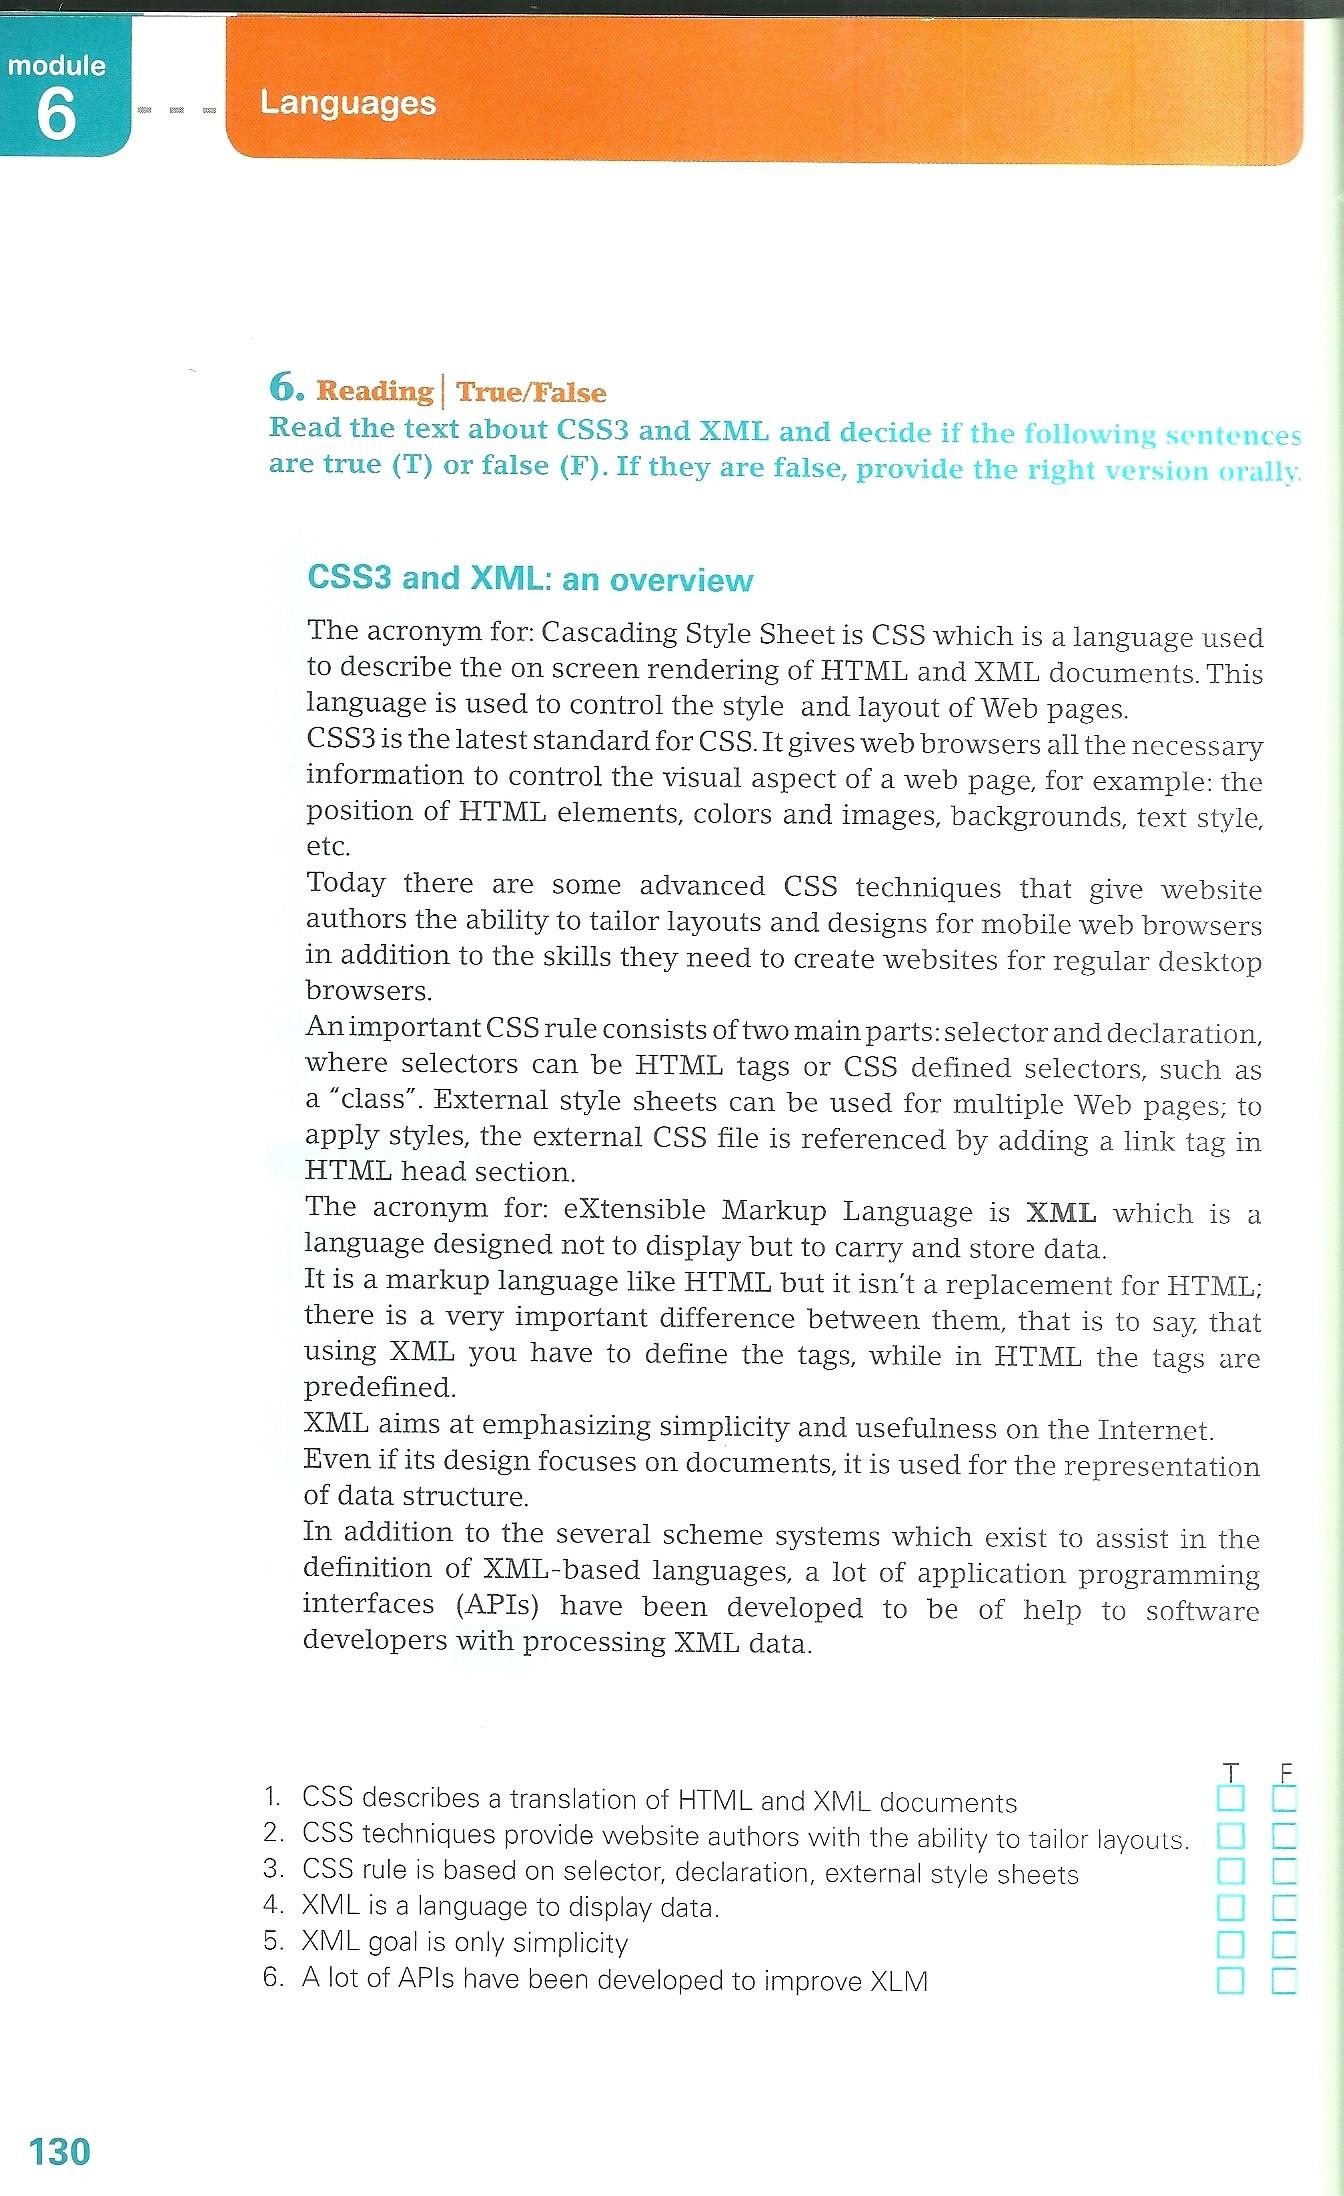 CSS3 and XML